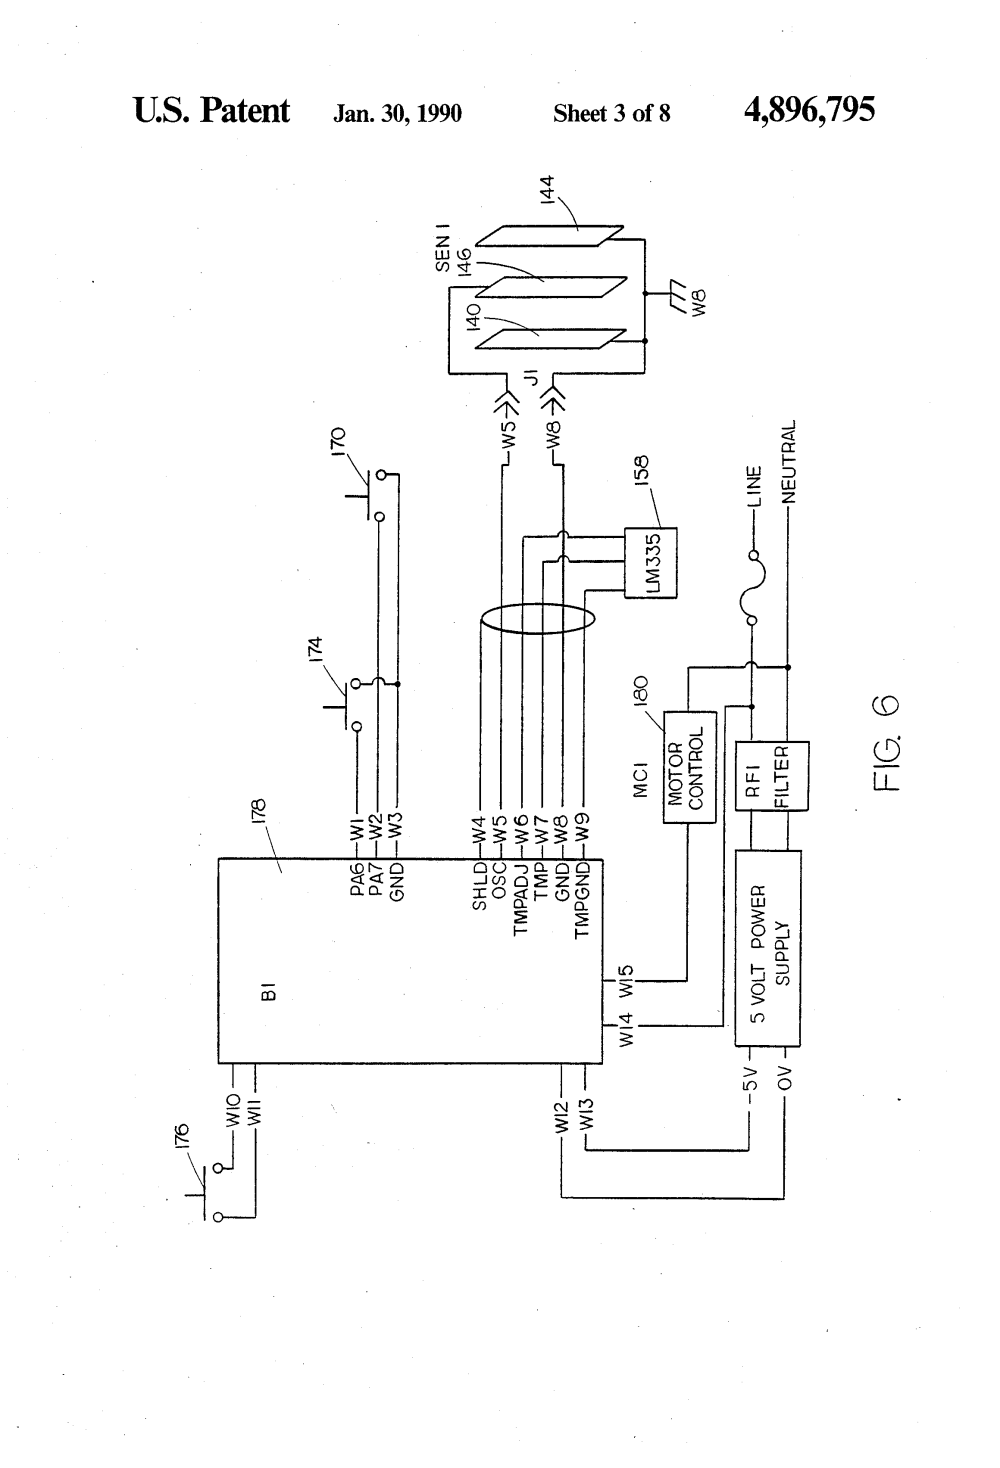 medium resolution of dryer wiring diagram schematic crop electric dryer 3 wire dryer wiring diagram 4 prong dryer wiring